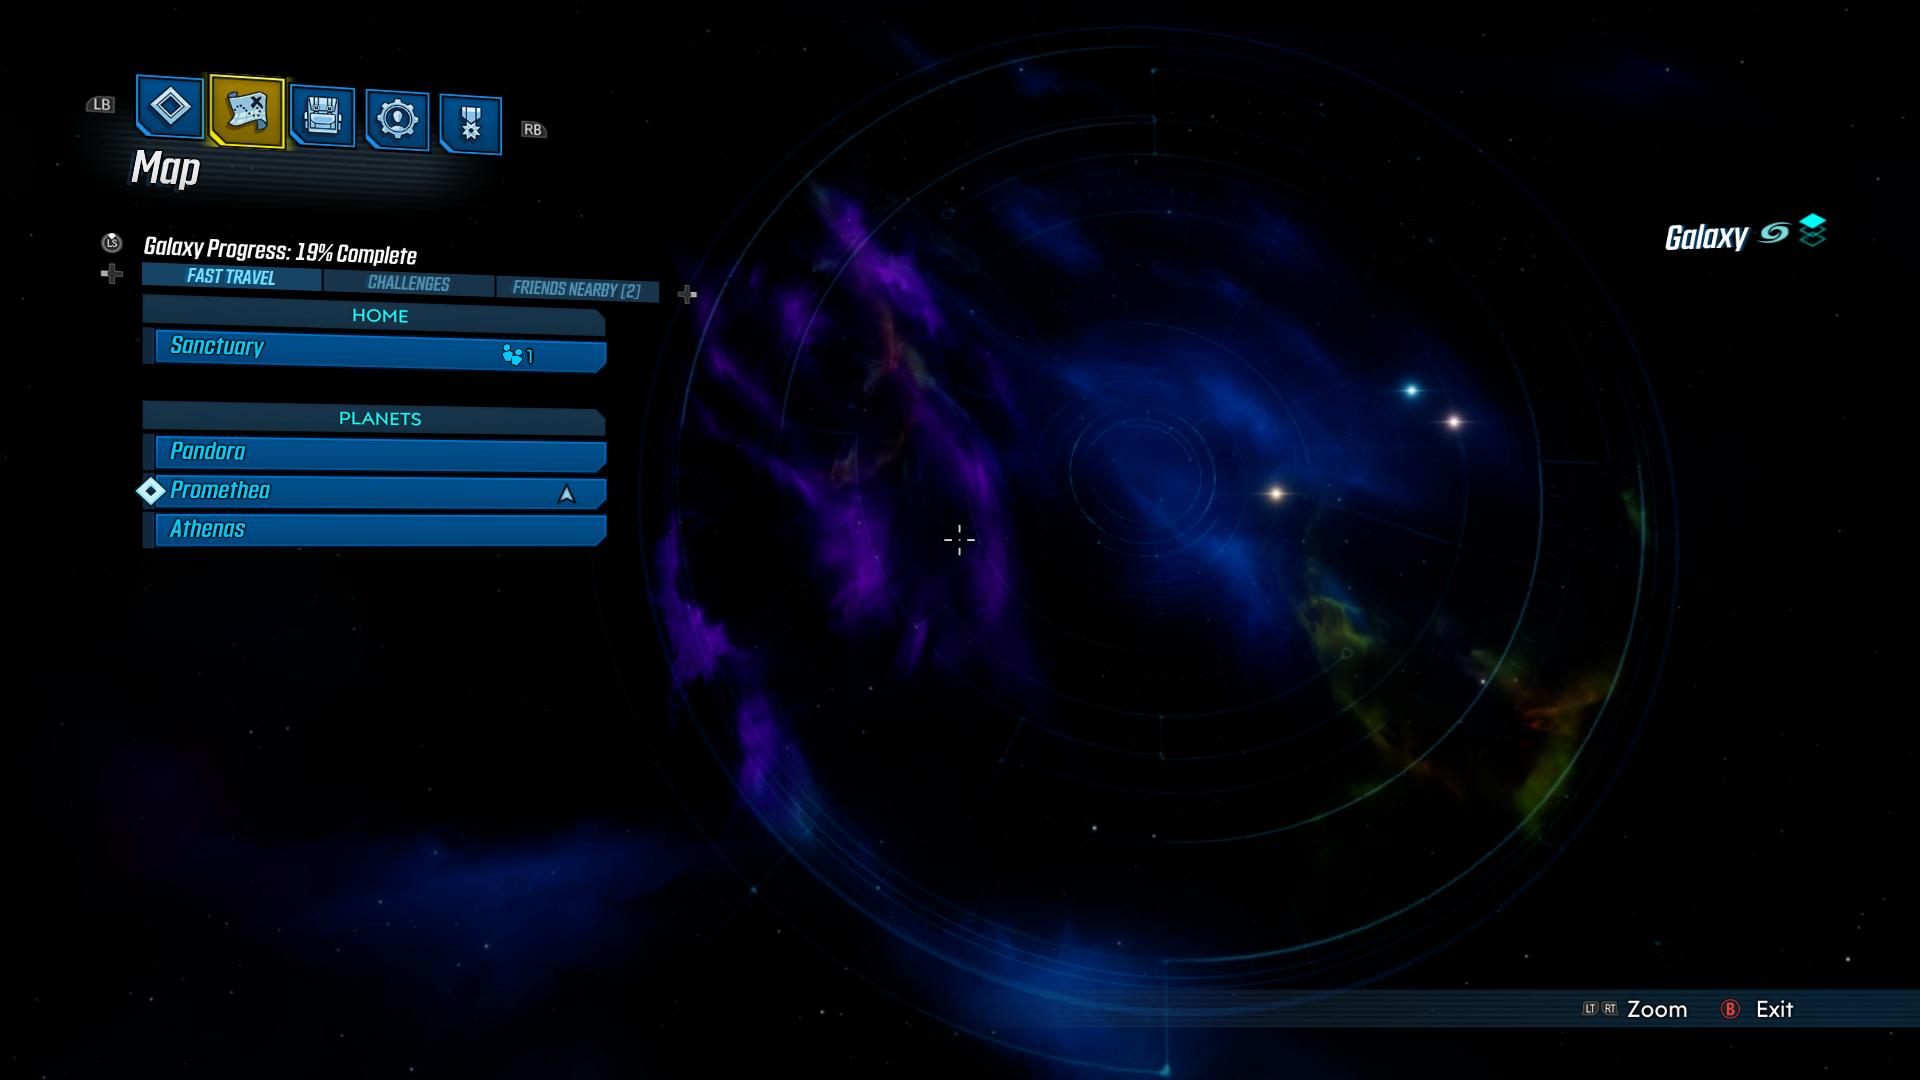 galaxy screen.png